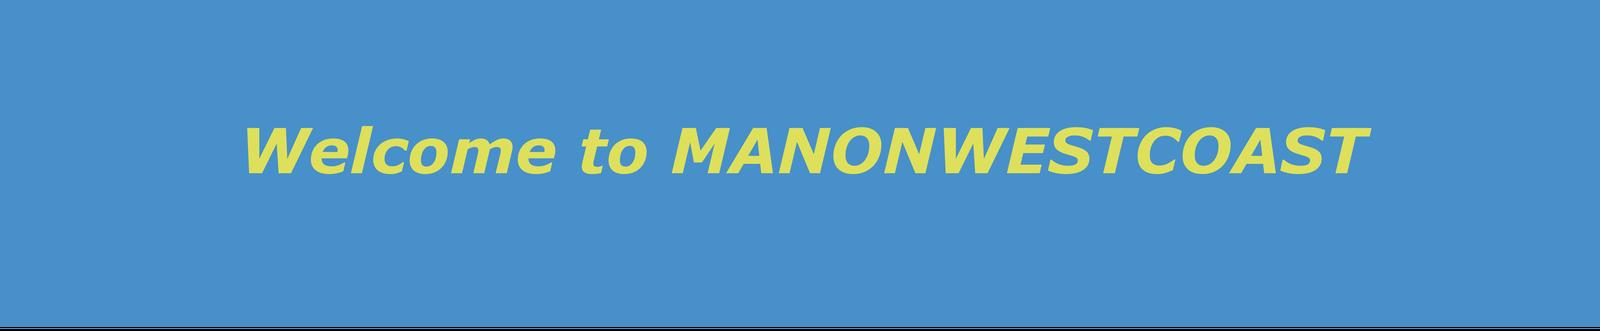 manonwestcoast